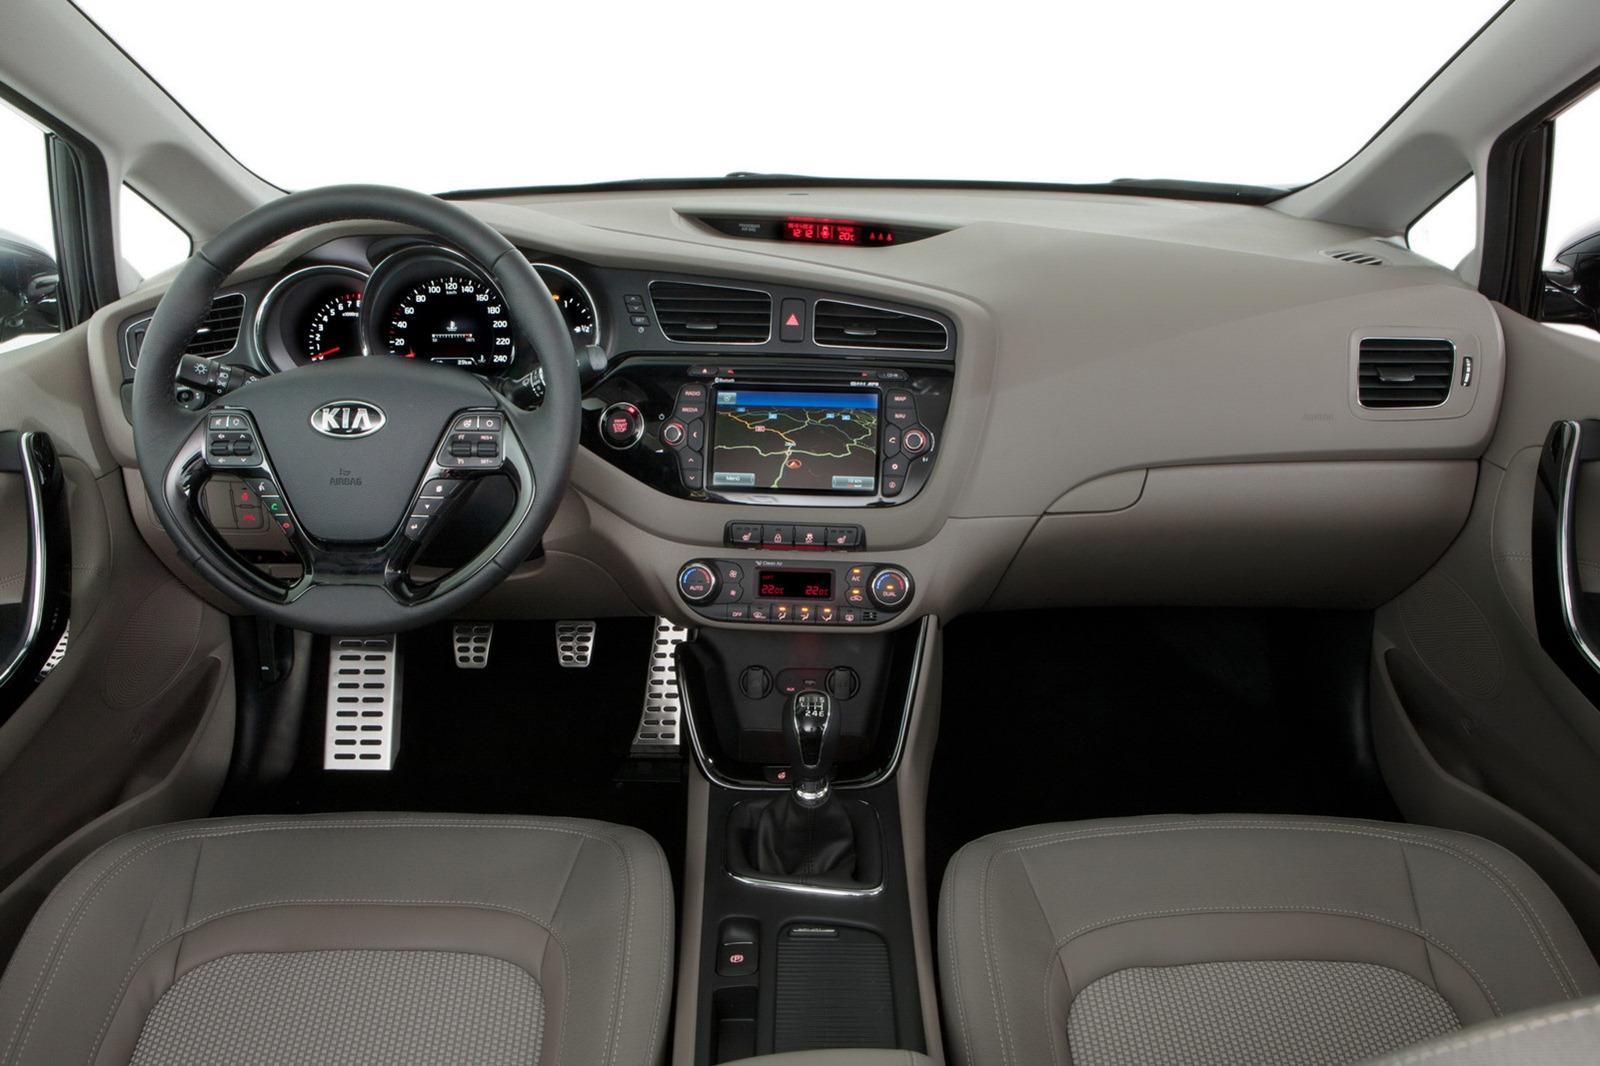 Kia Picanto 2016 >> New 2012 Kia Cee'd Photos Released - autoevolution